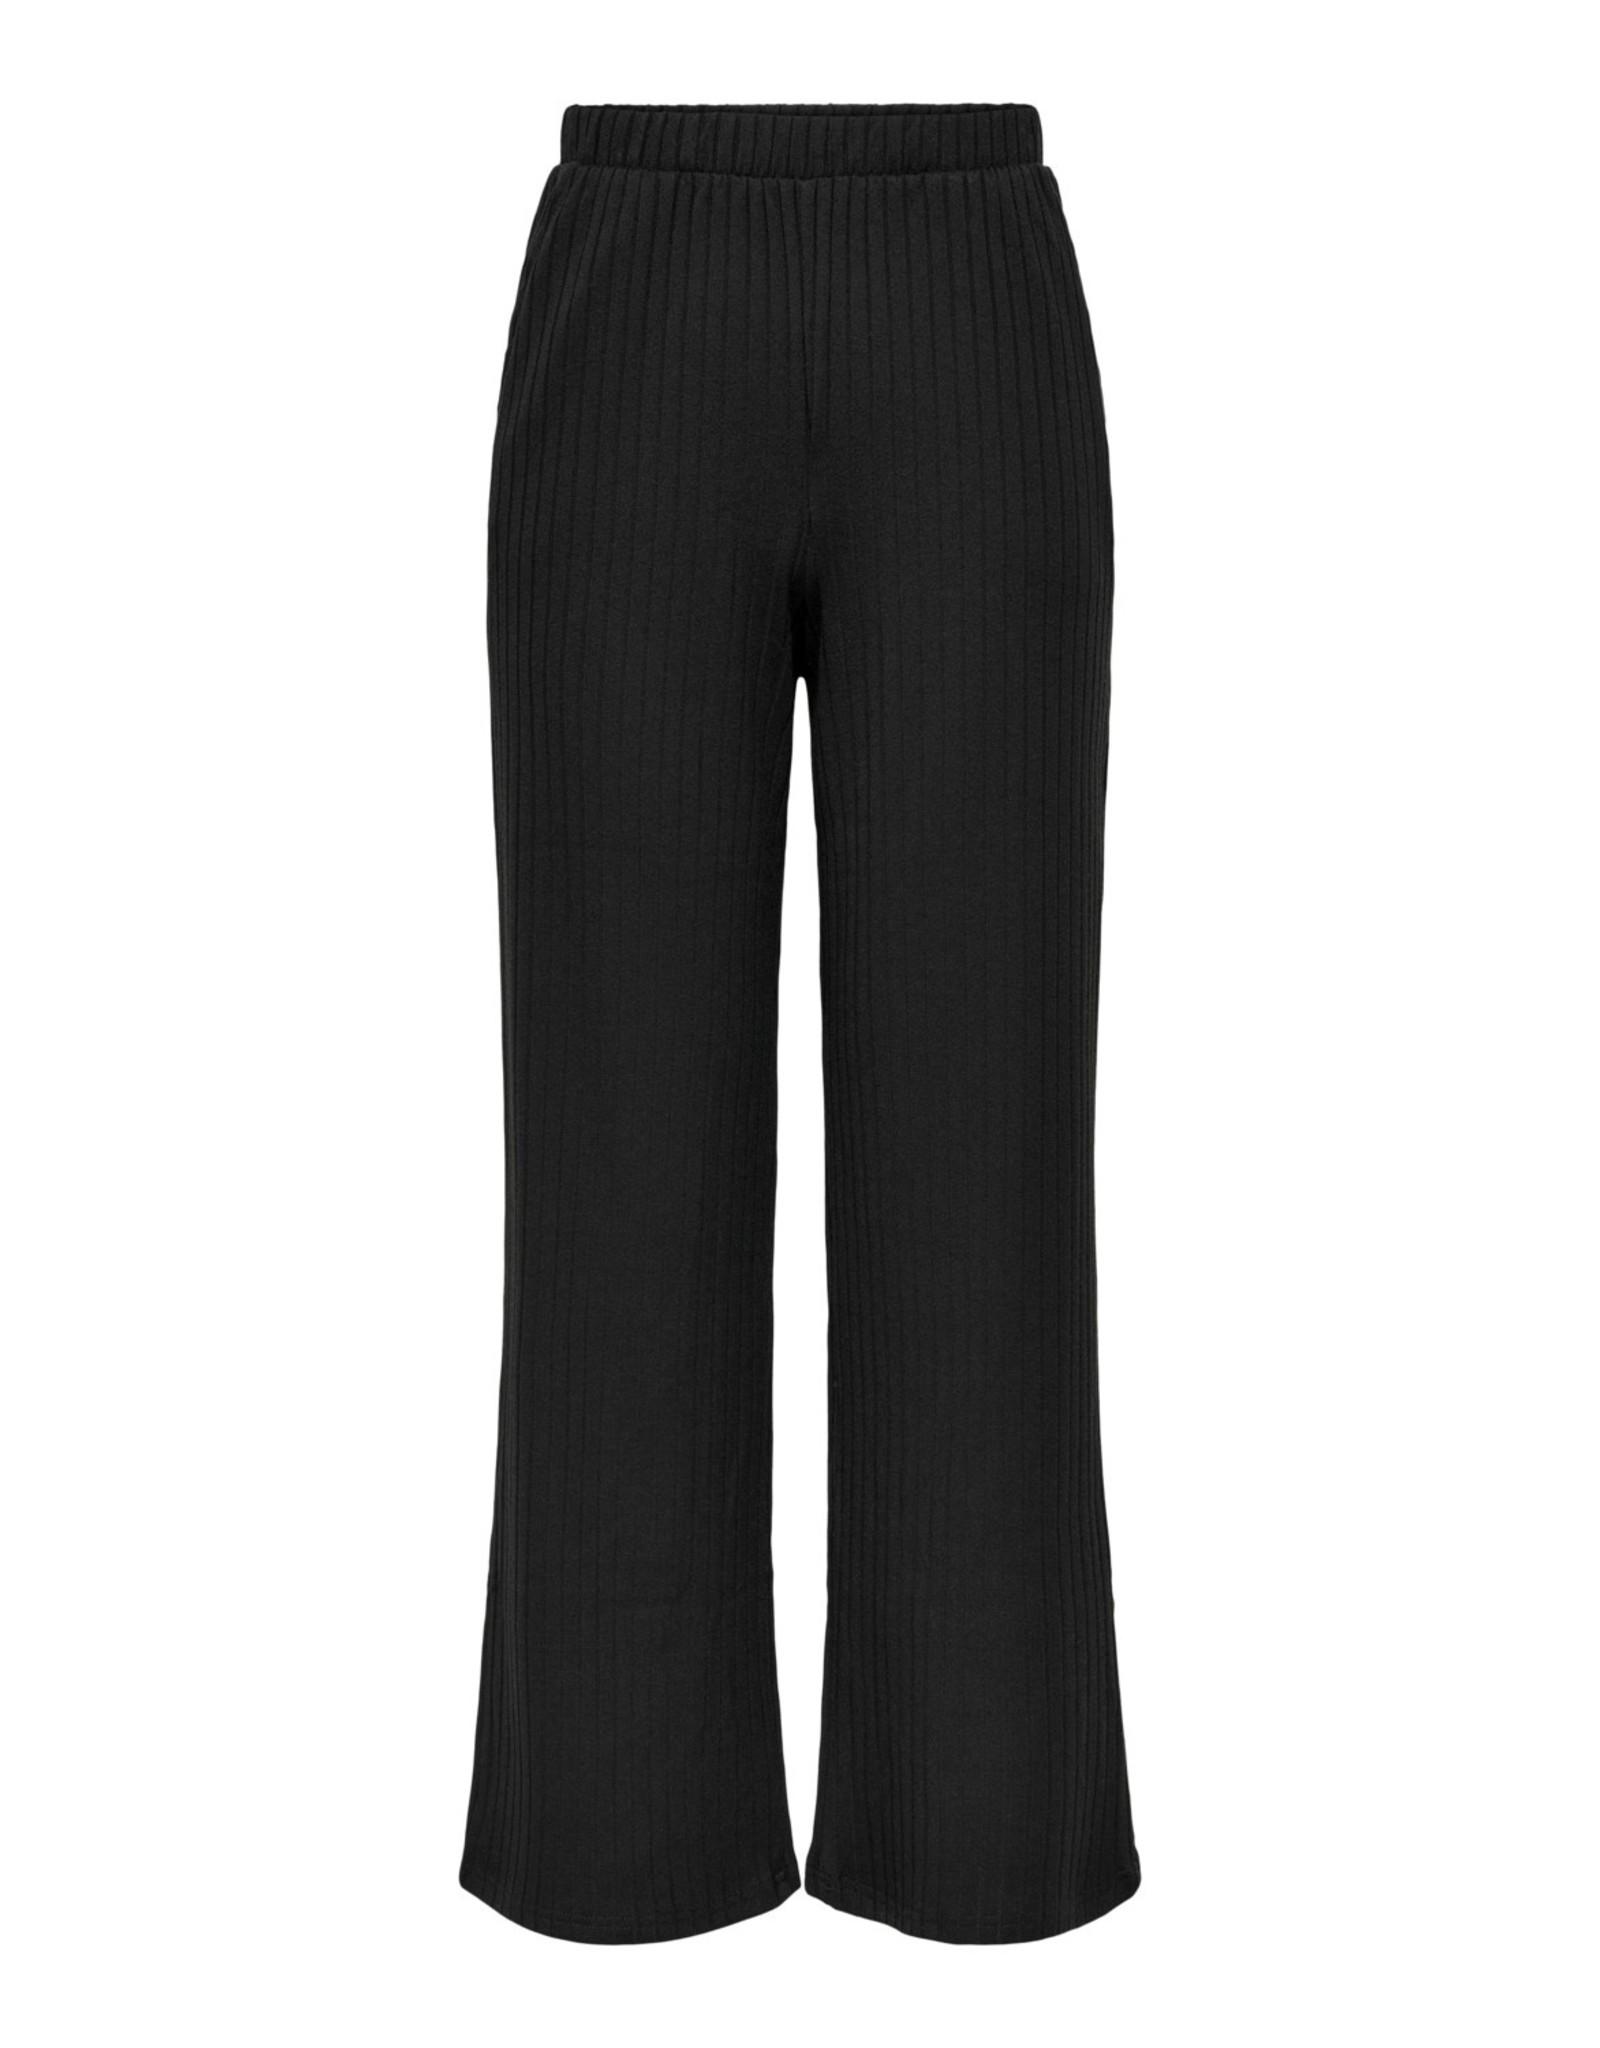 LOUNGE PANTS BLACK